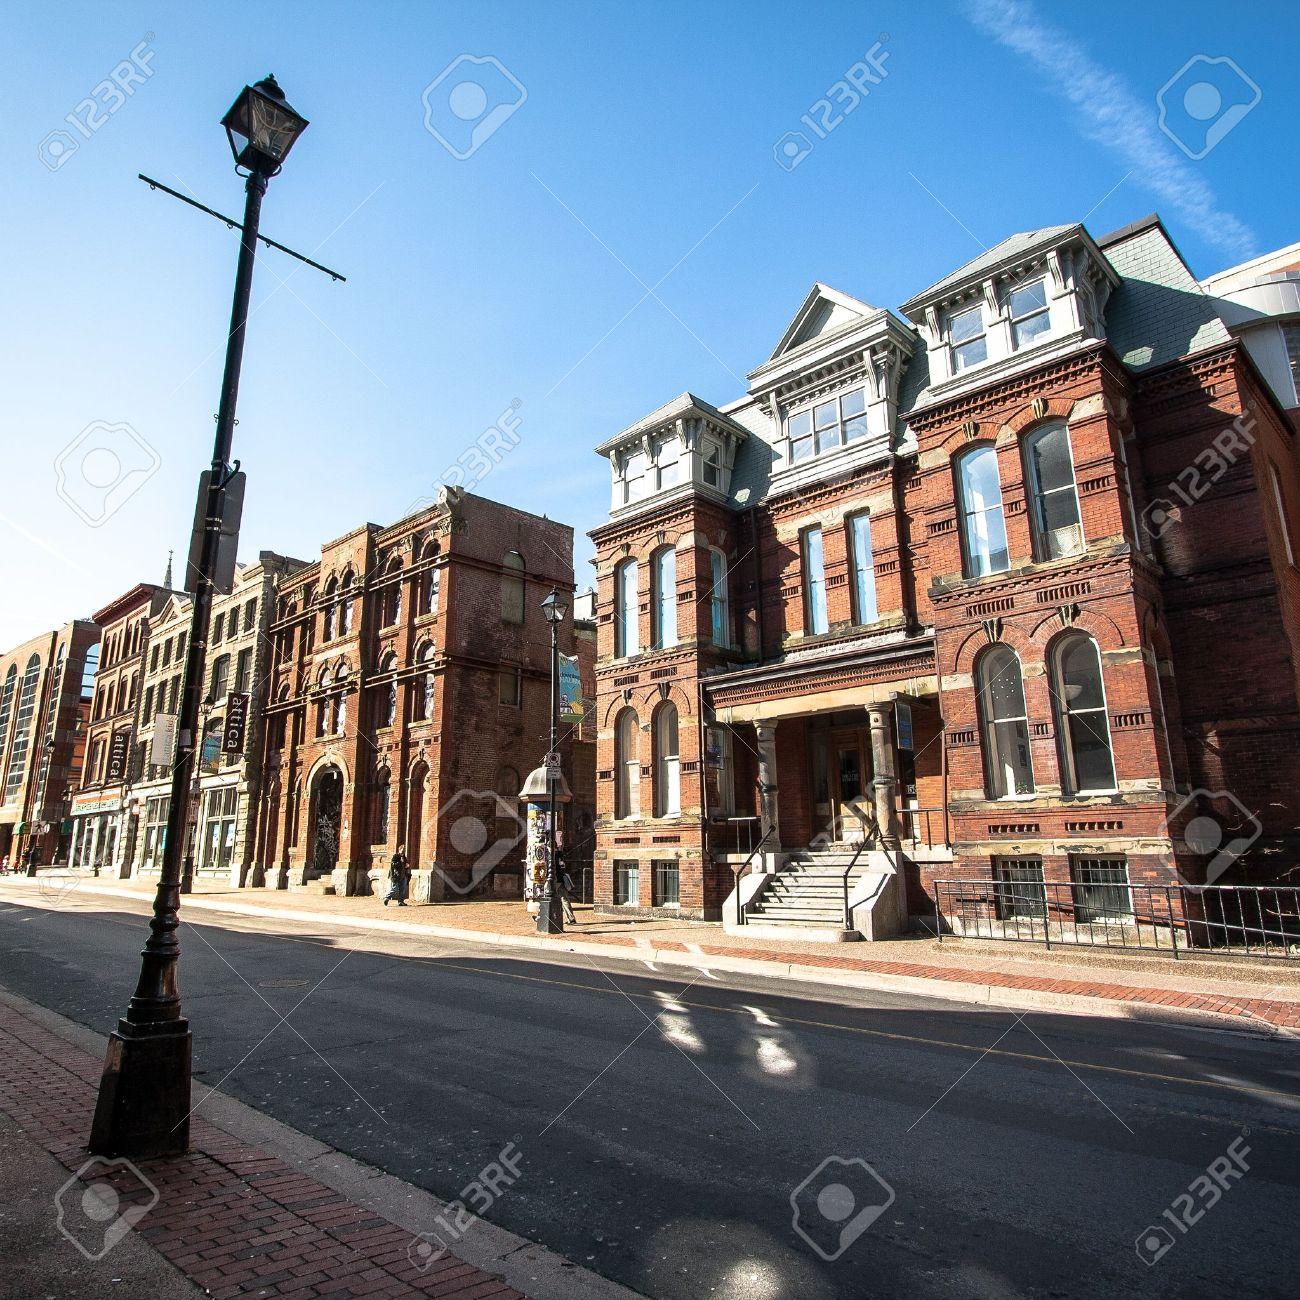 Historic Buildings in Downtown Halifax, Nova Scotia, Canada Stock Photo - 18395705